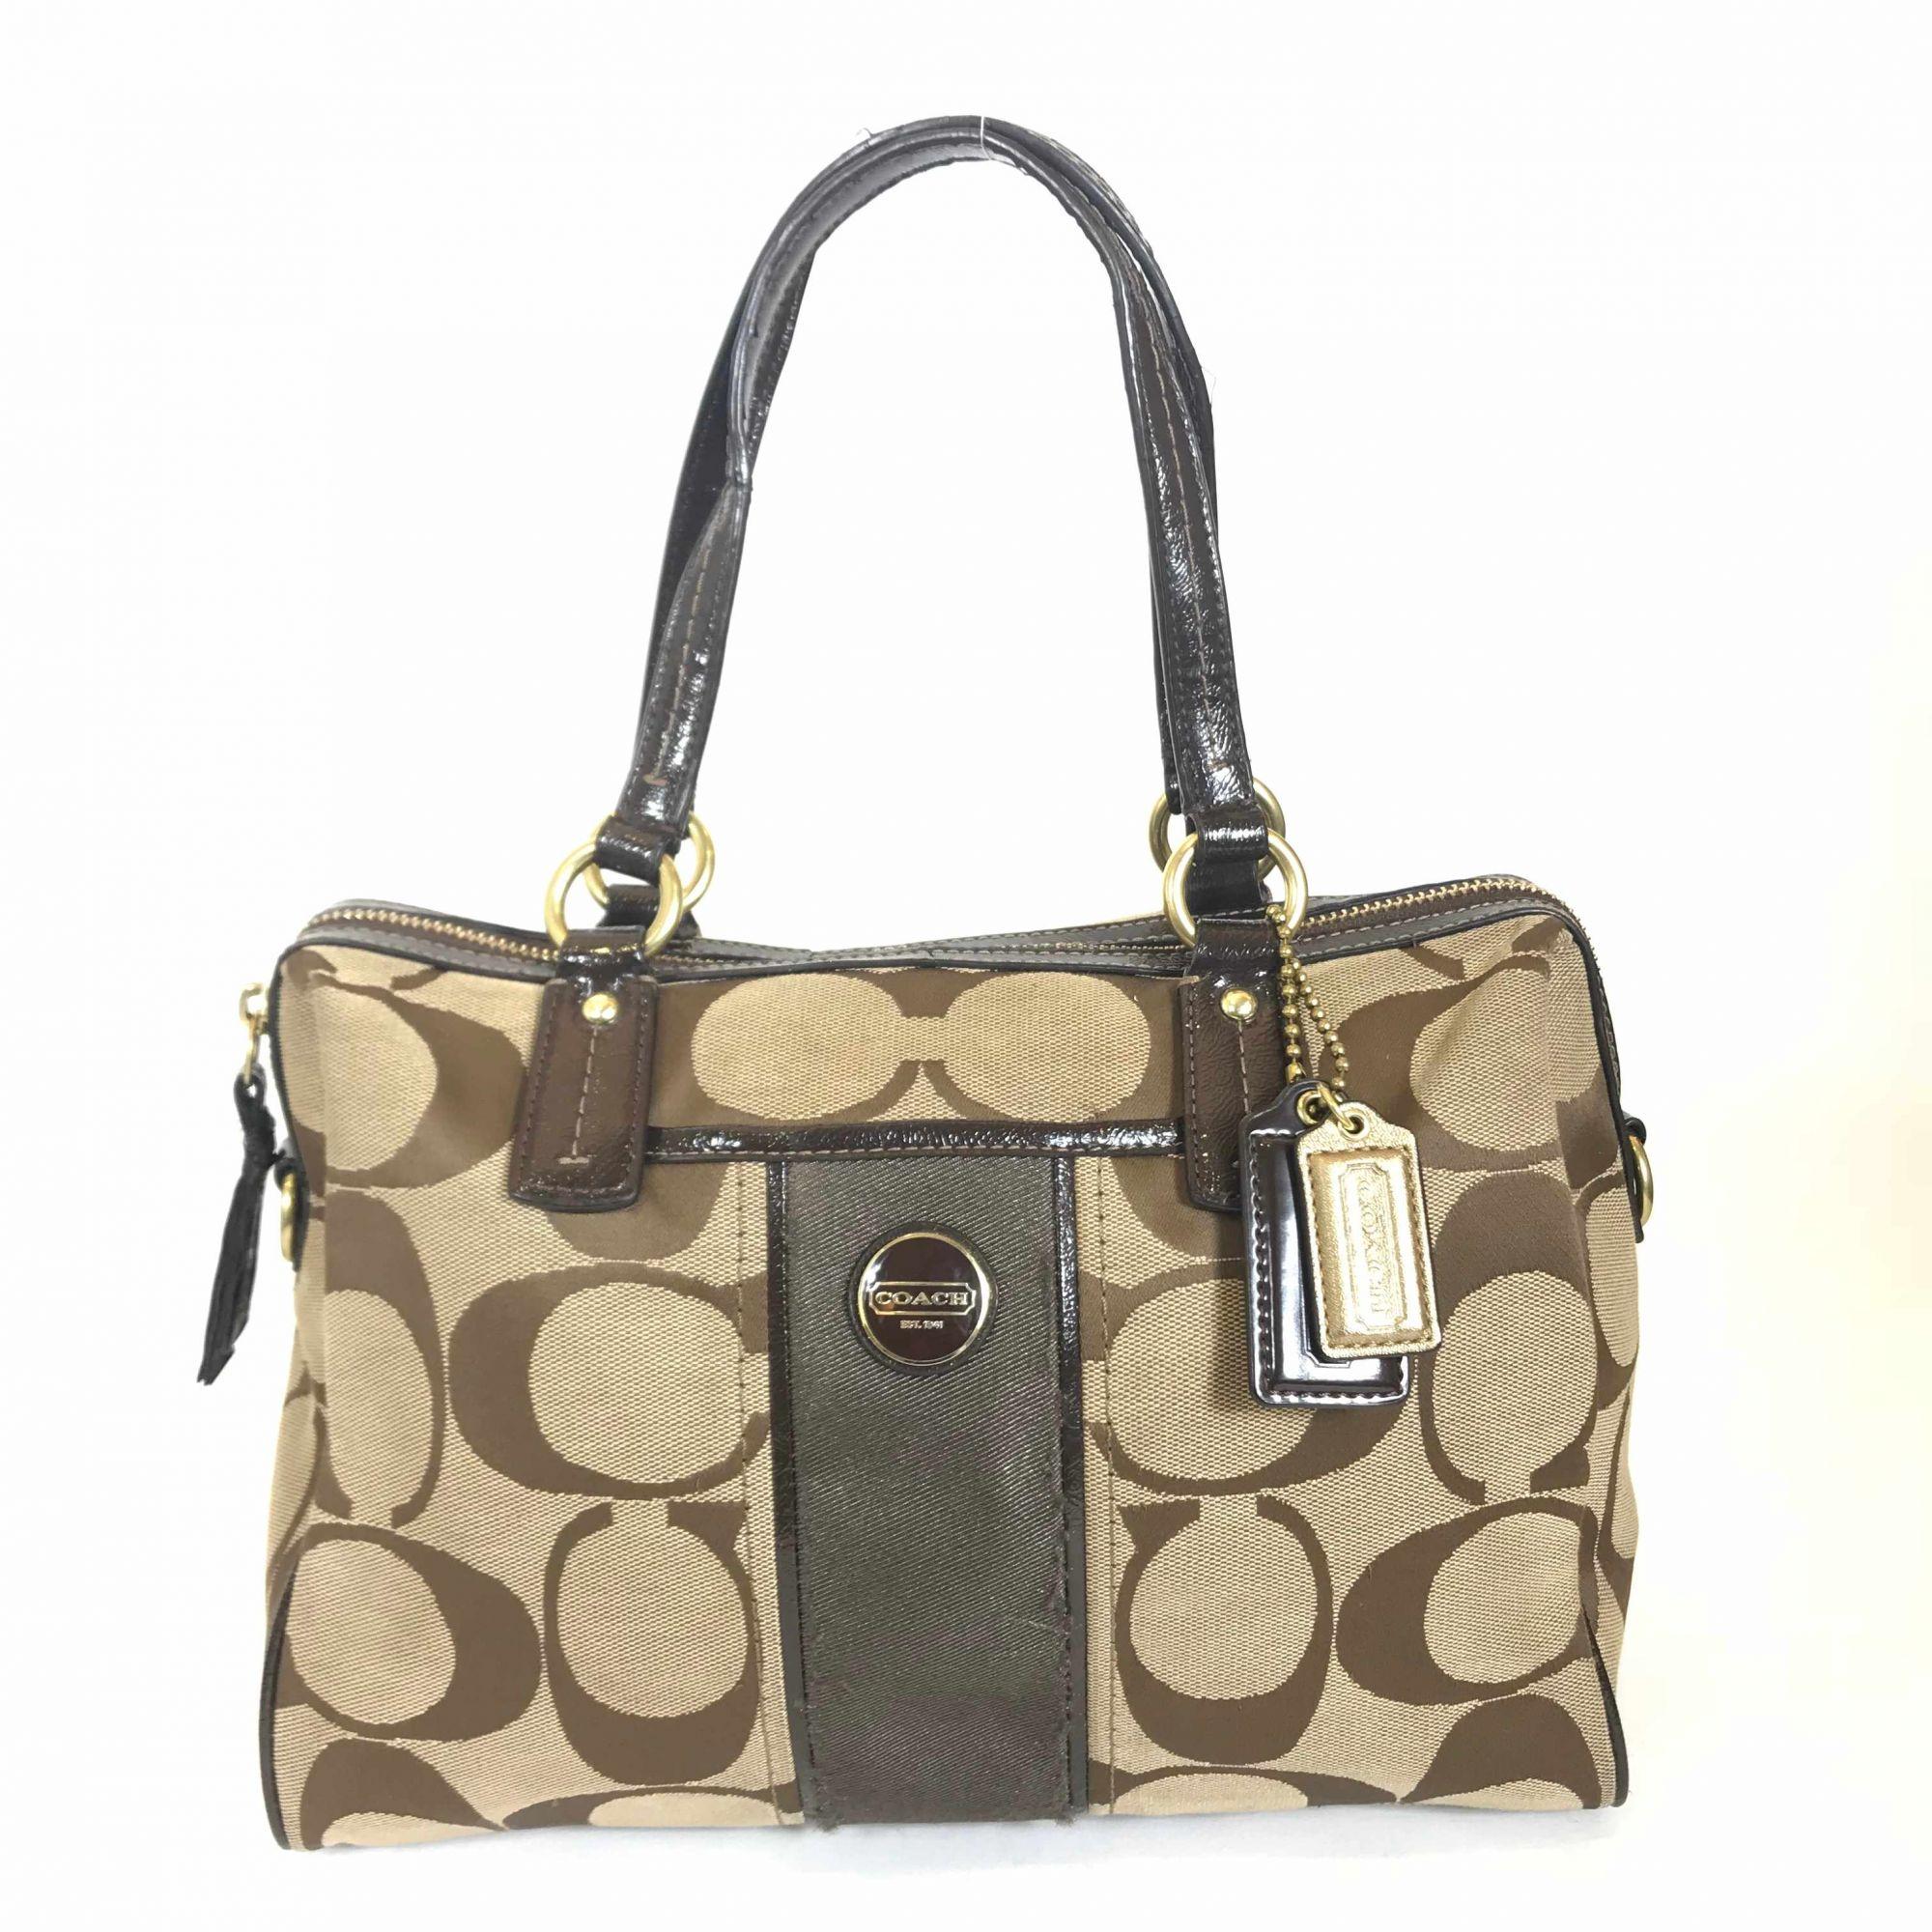 Monogram Dark Brown Leather Canvas Bag